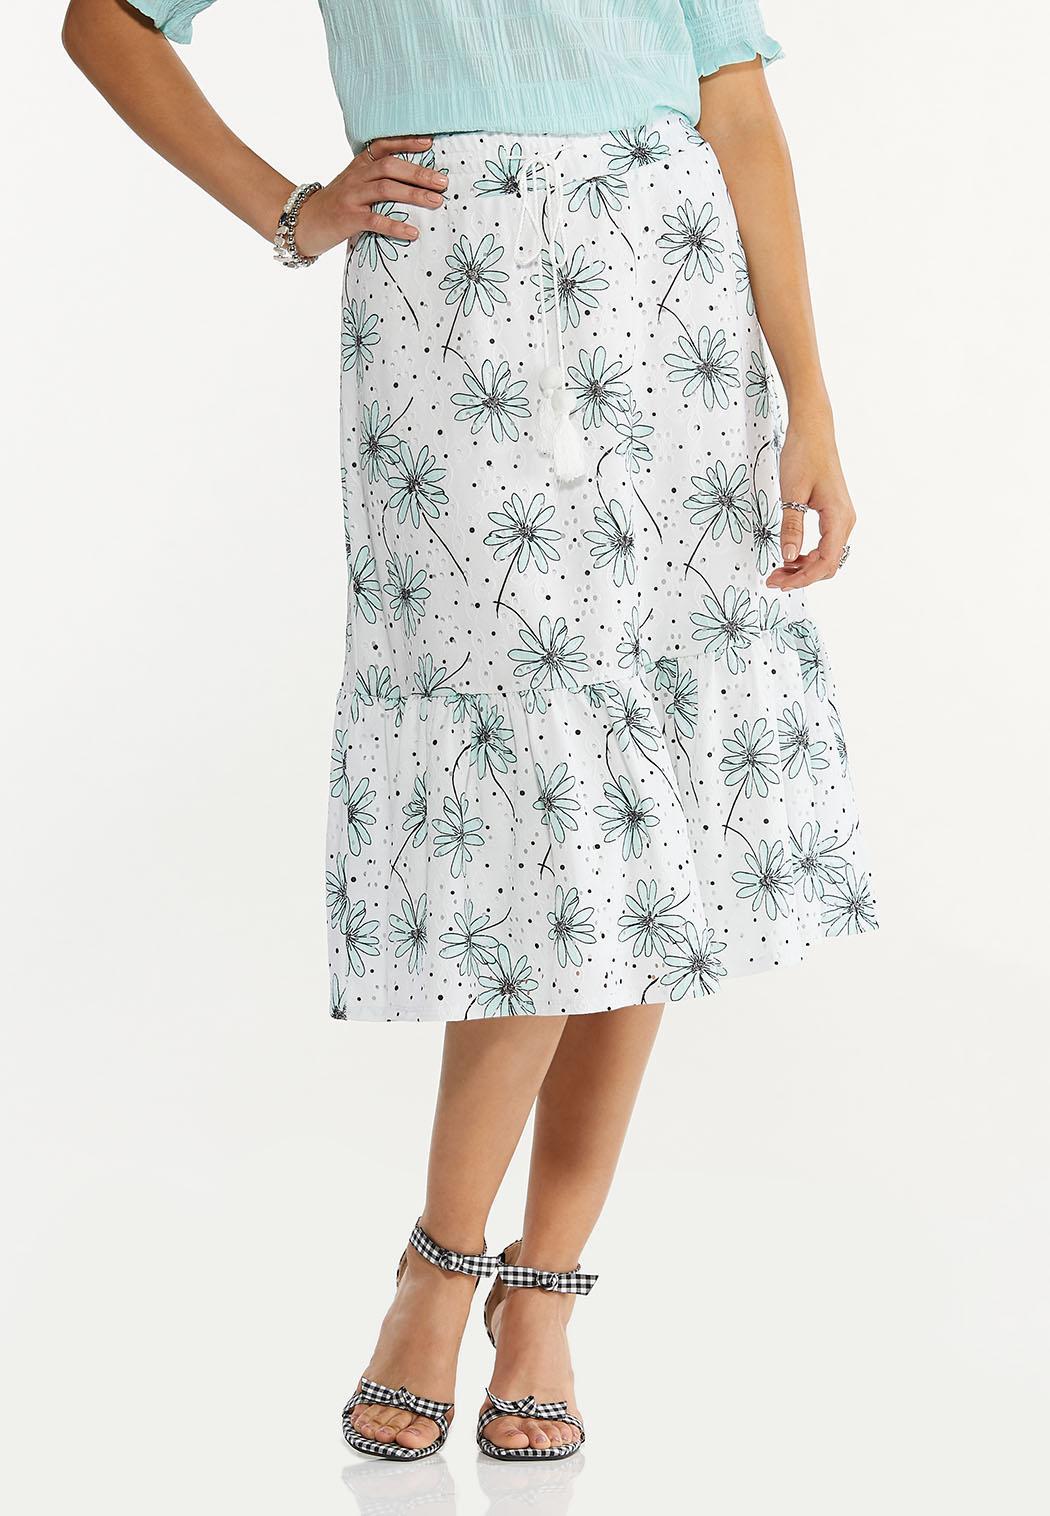 Daisy Eyelet Midi Skirt